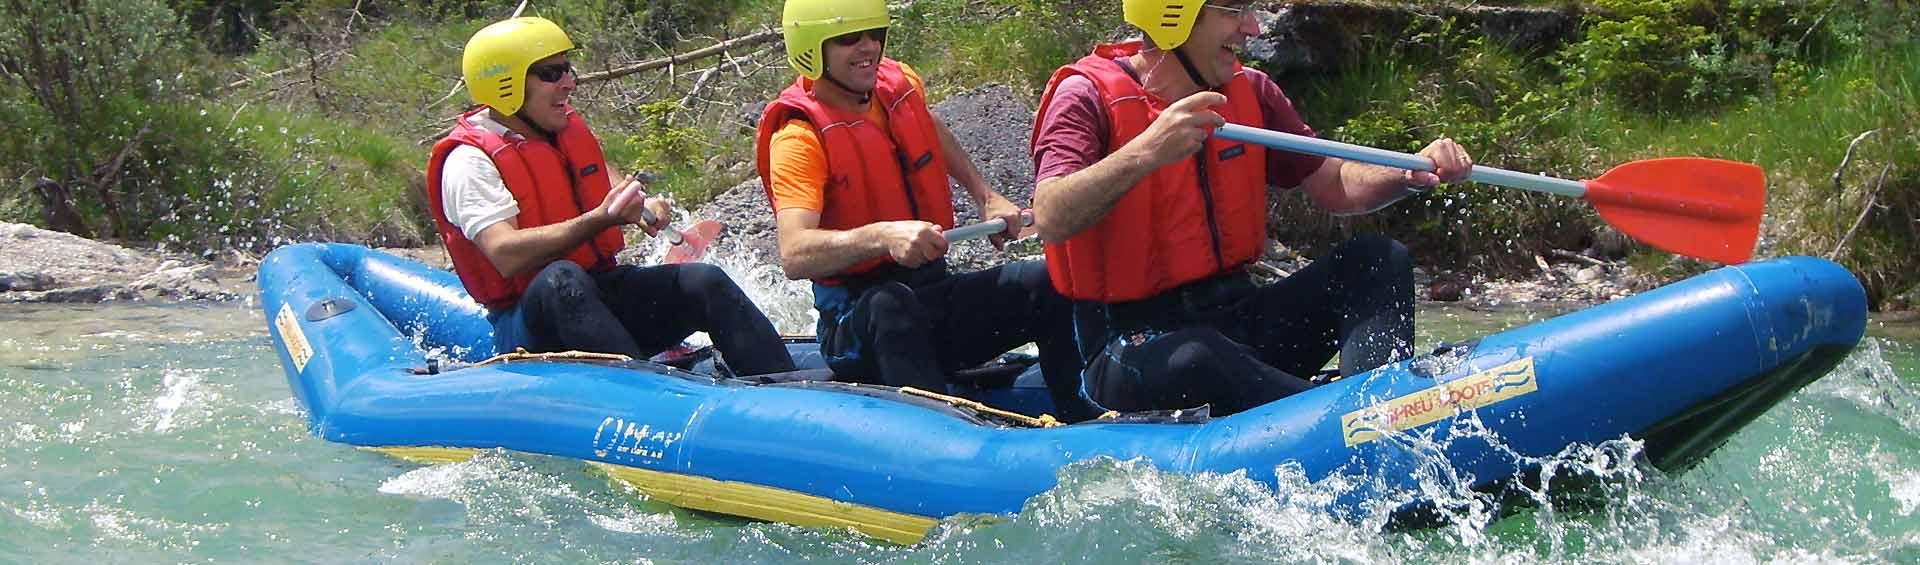 Teamevent Kanu Isar Wildfluss Kanutour in Bayern, reizvolle Natur Strecke Sylvenstein bei Fall nach Lenggries,